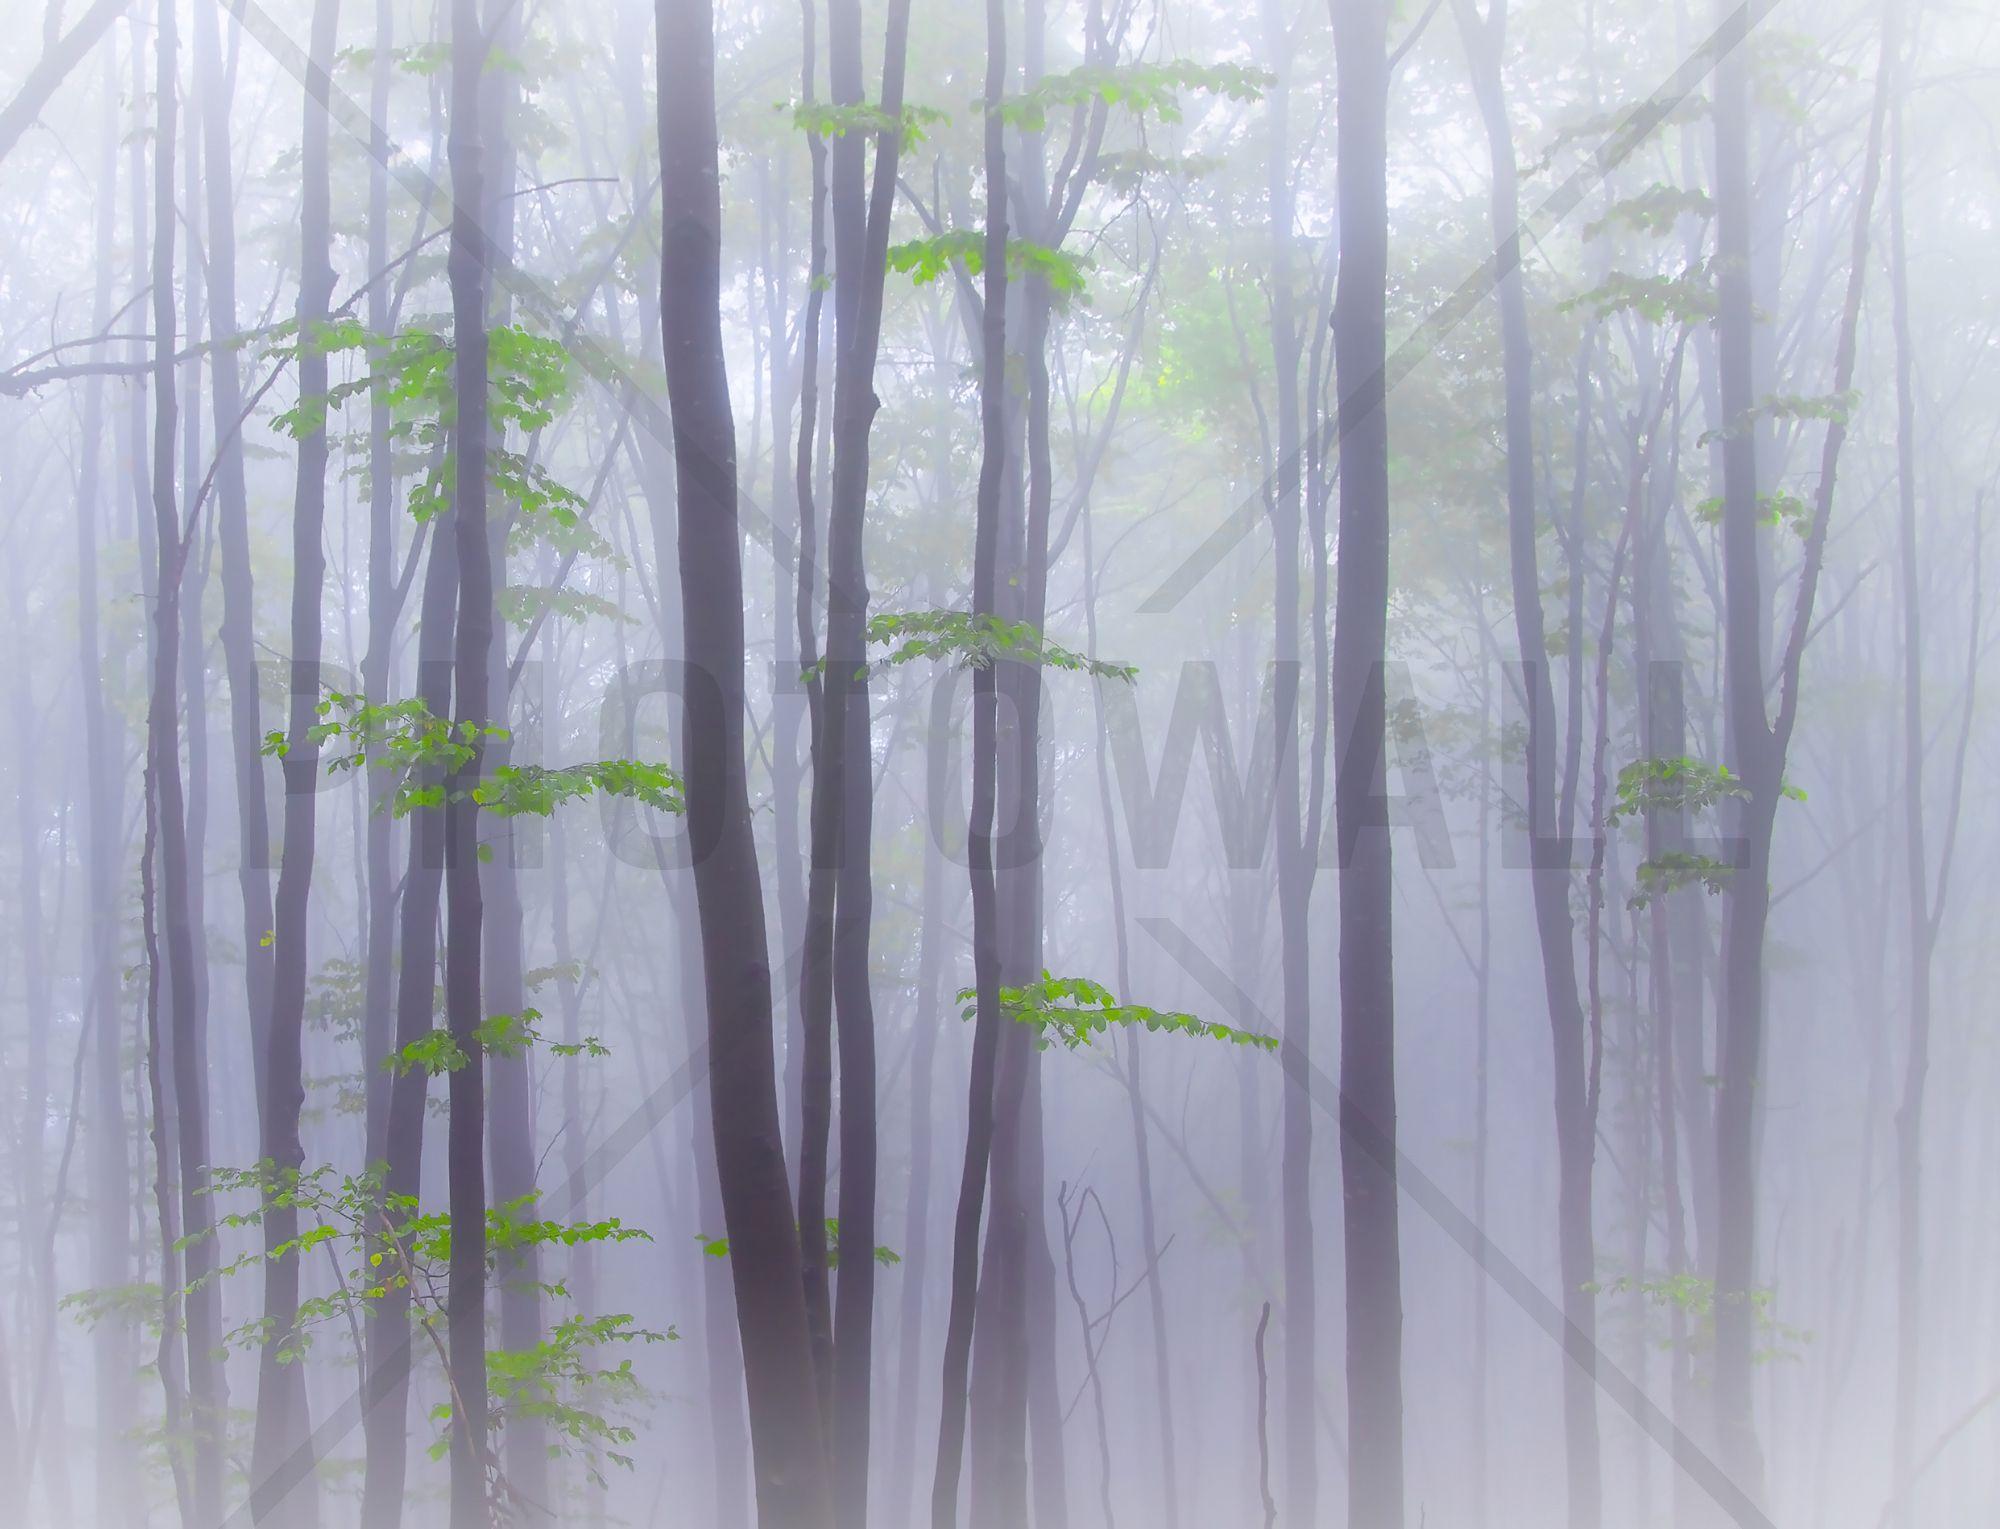 misty woods wall mural photo wallpaper photowall ideas for misty woods wall mural photo wallpaper photowall